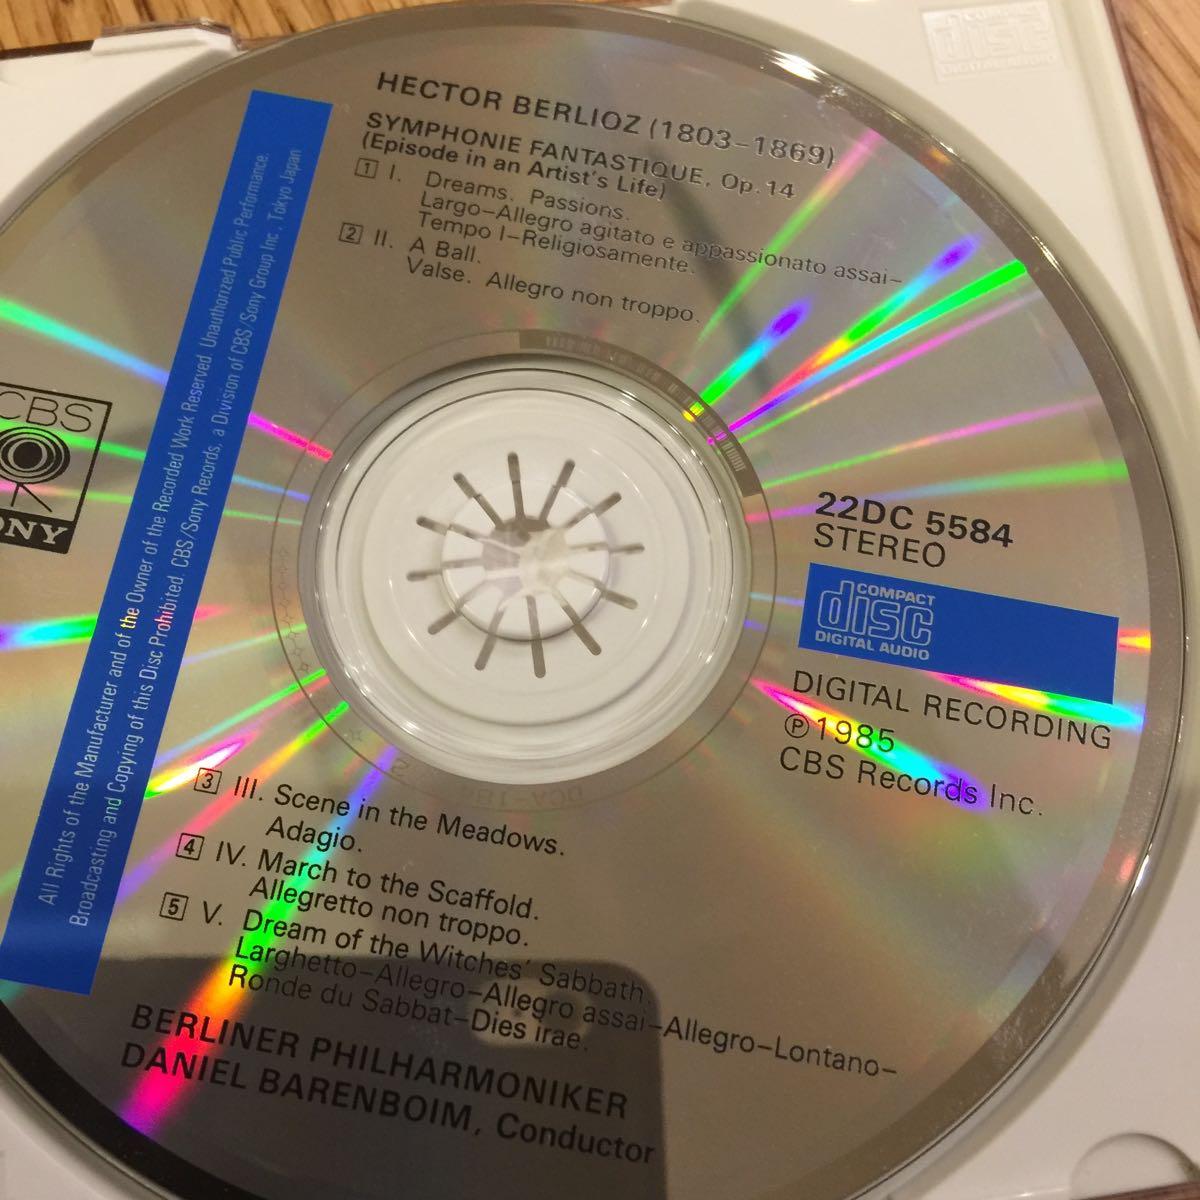 CD ベルリオーズ 交響曲 作品14a ダニエル・バレンボイム指揮 ベルリン・フィルハーモニー管弦楽団 BERLIOZ SYMPHONIES FANTASTIQUE_画像6